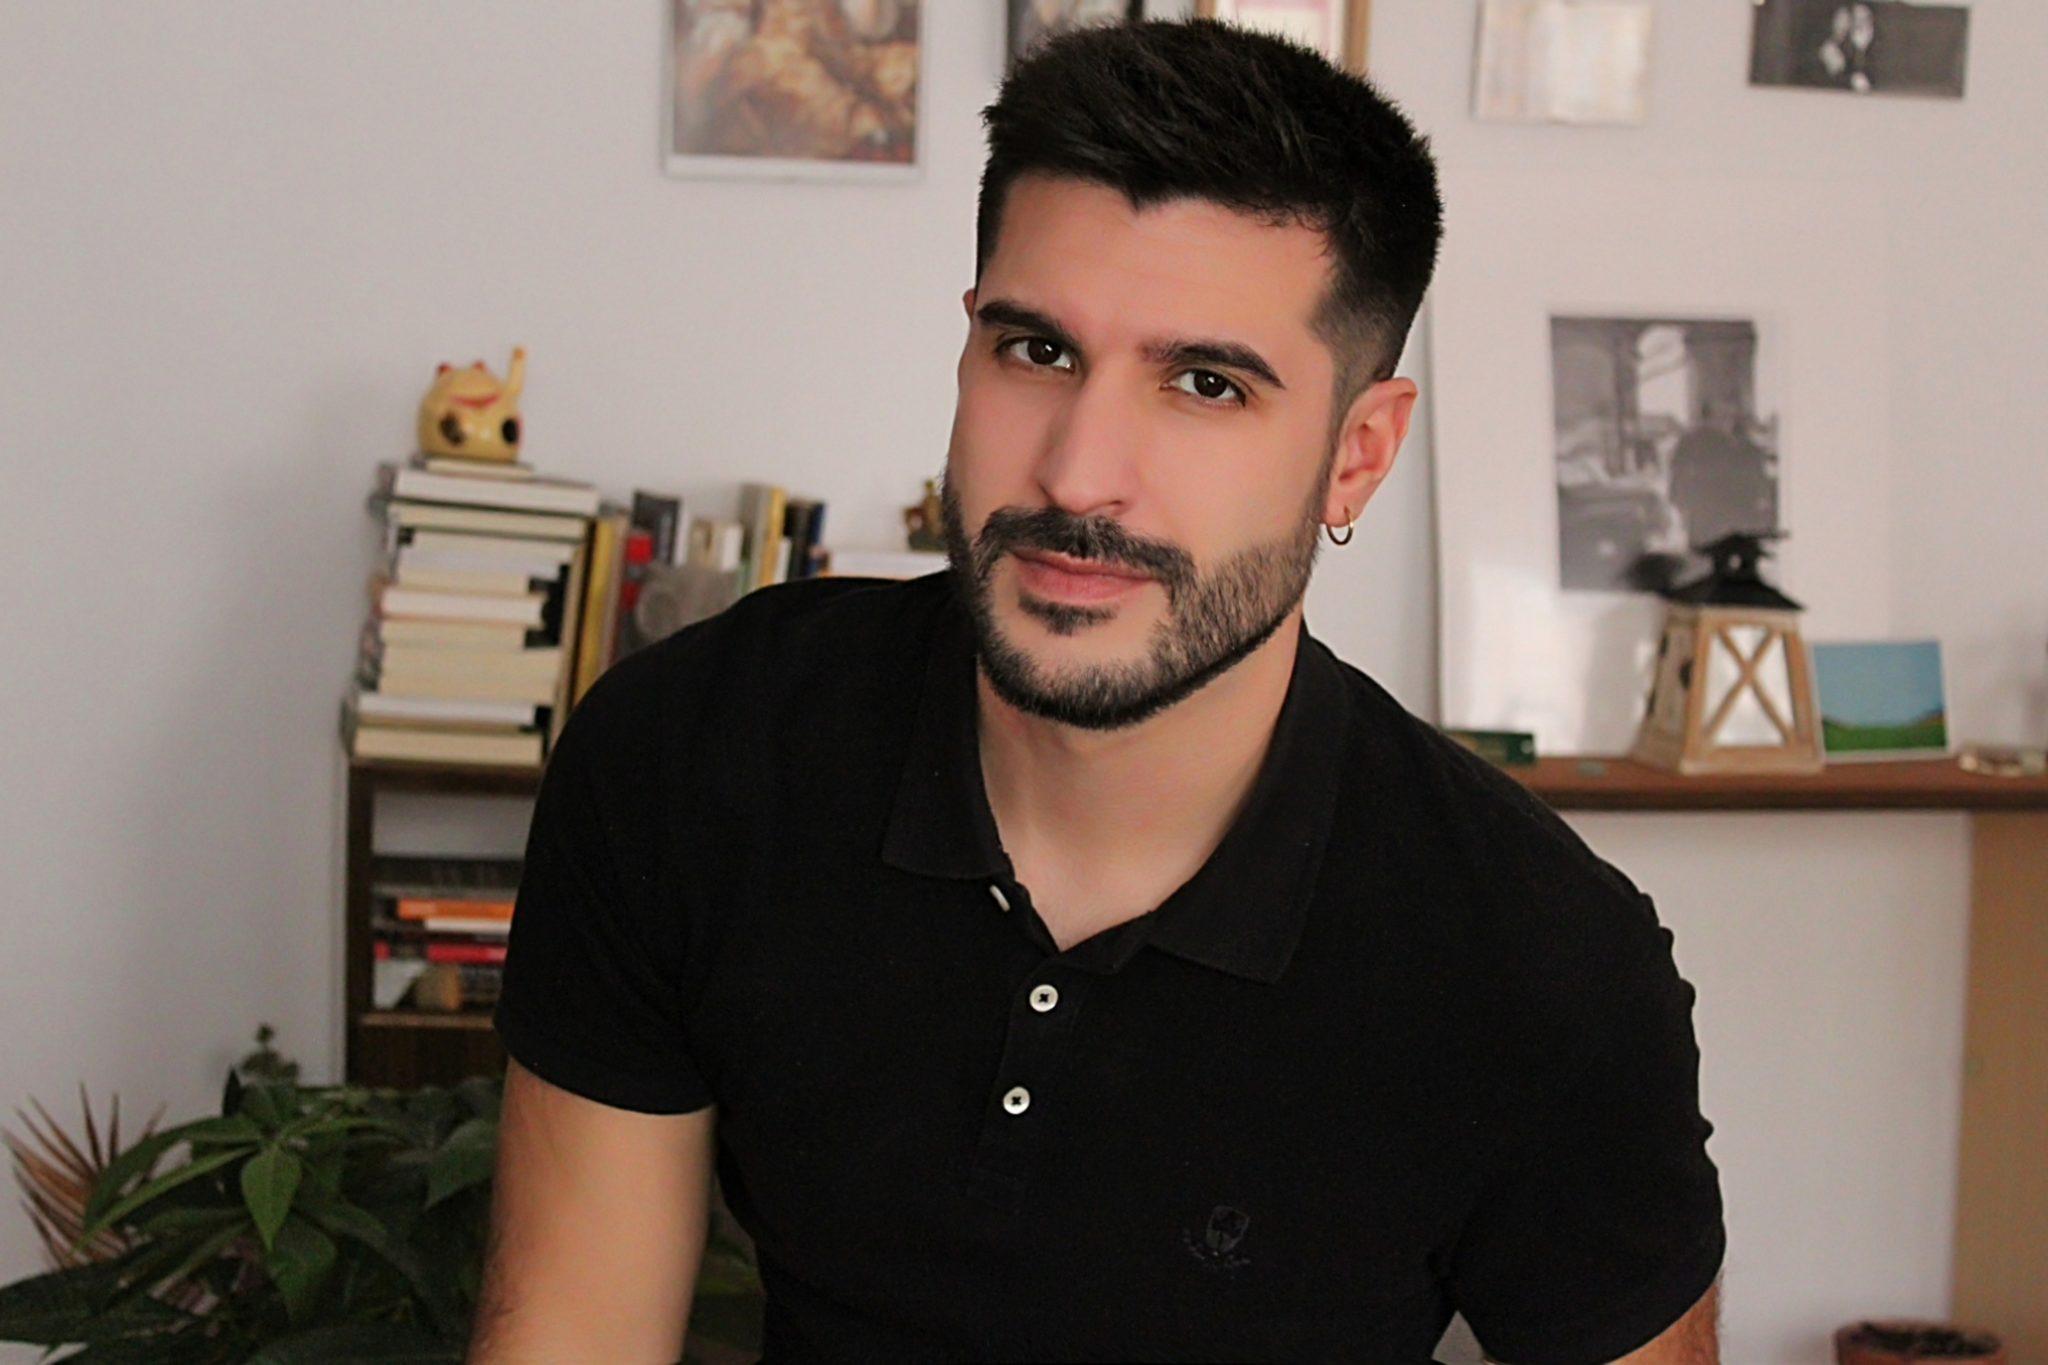 Aníbal Martín